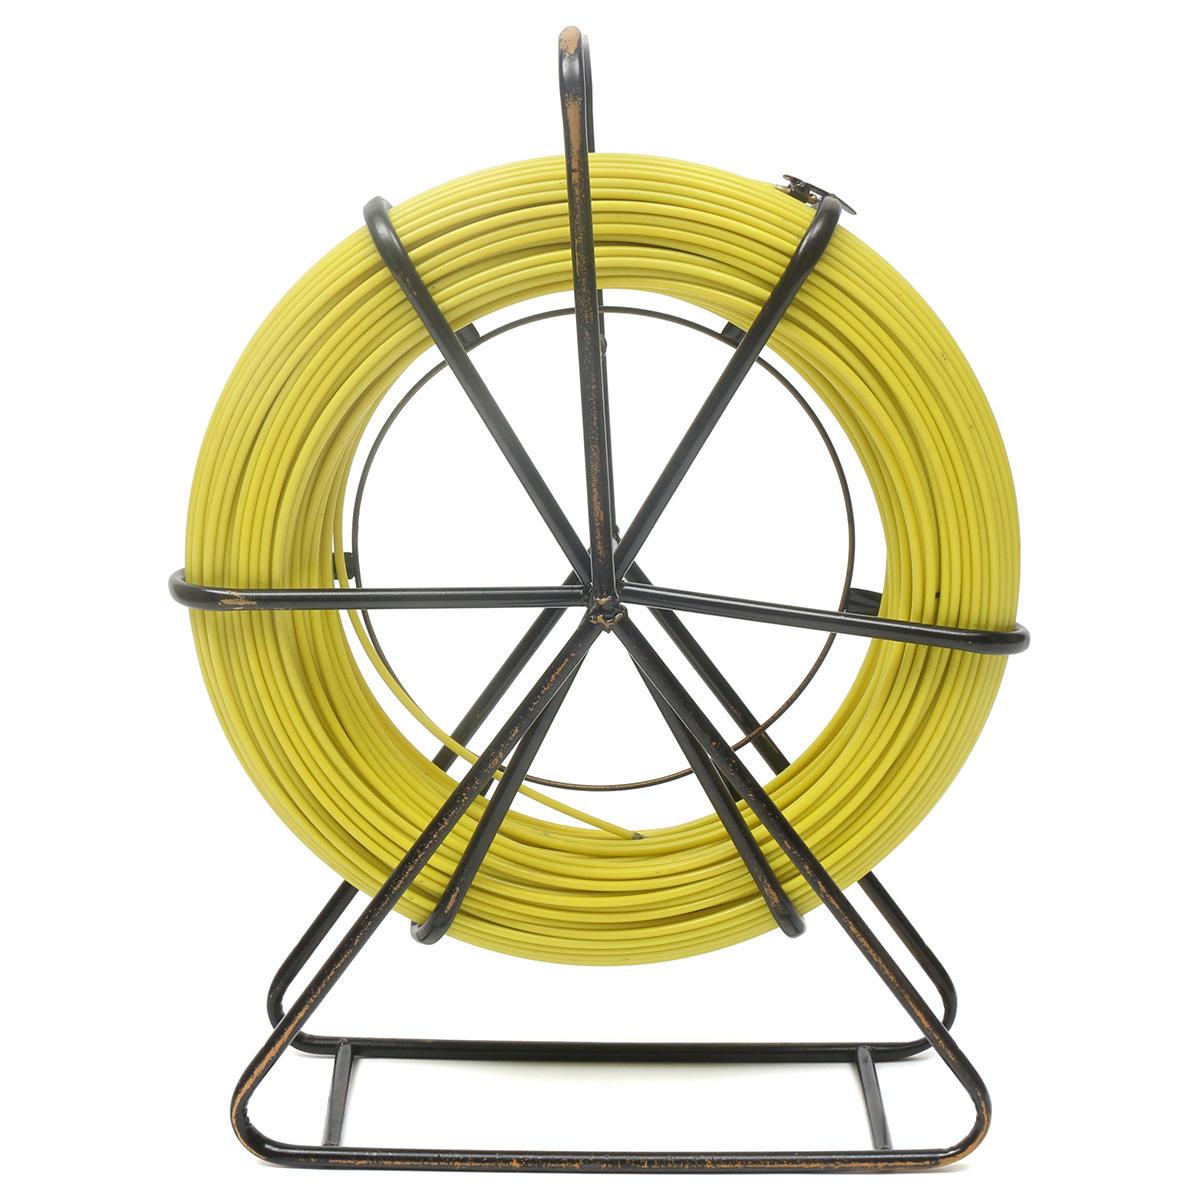 130m 6mm Fish Tape Fiberglass Wire Cable Running Rod Duct Rodder Fishtape Puller